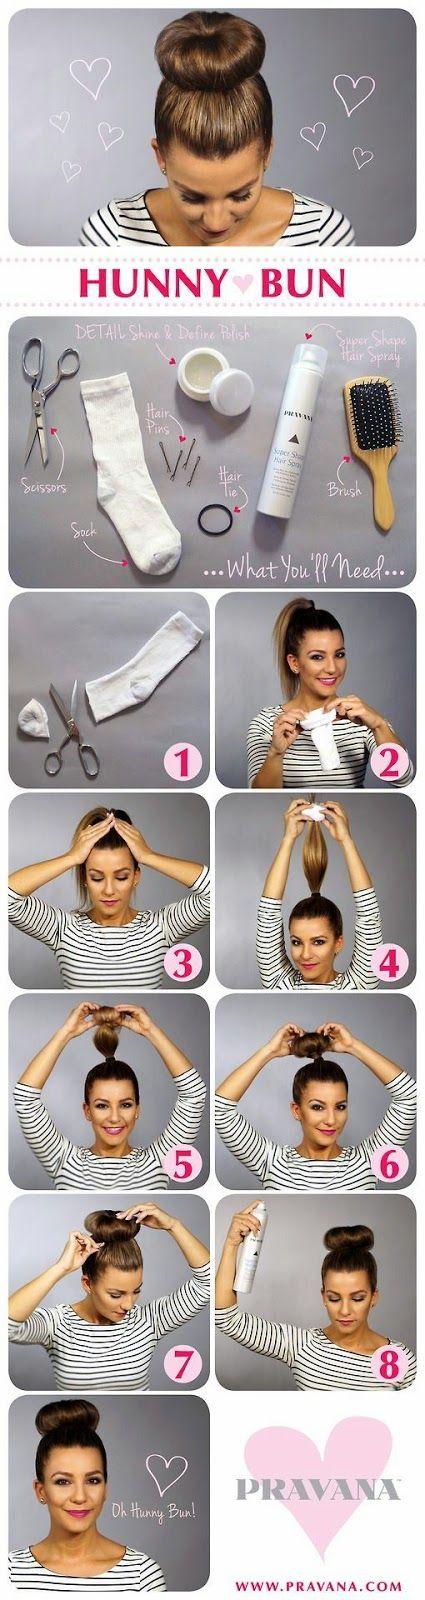 The Cutest Hunny Bun Hairstyle Tutoria - USA Fashion Trends